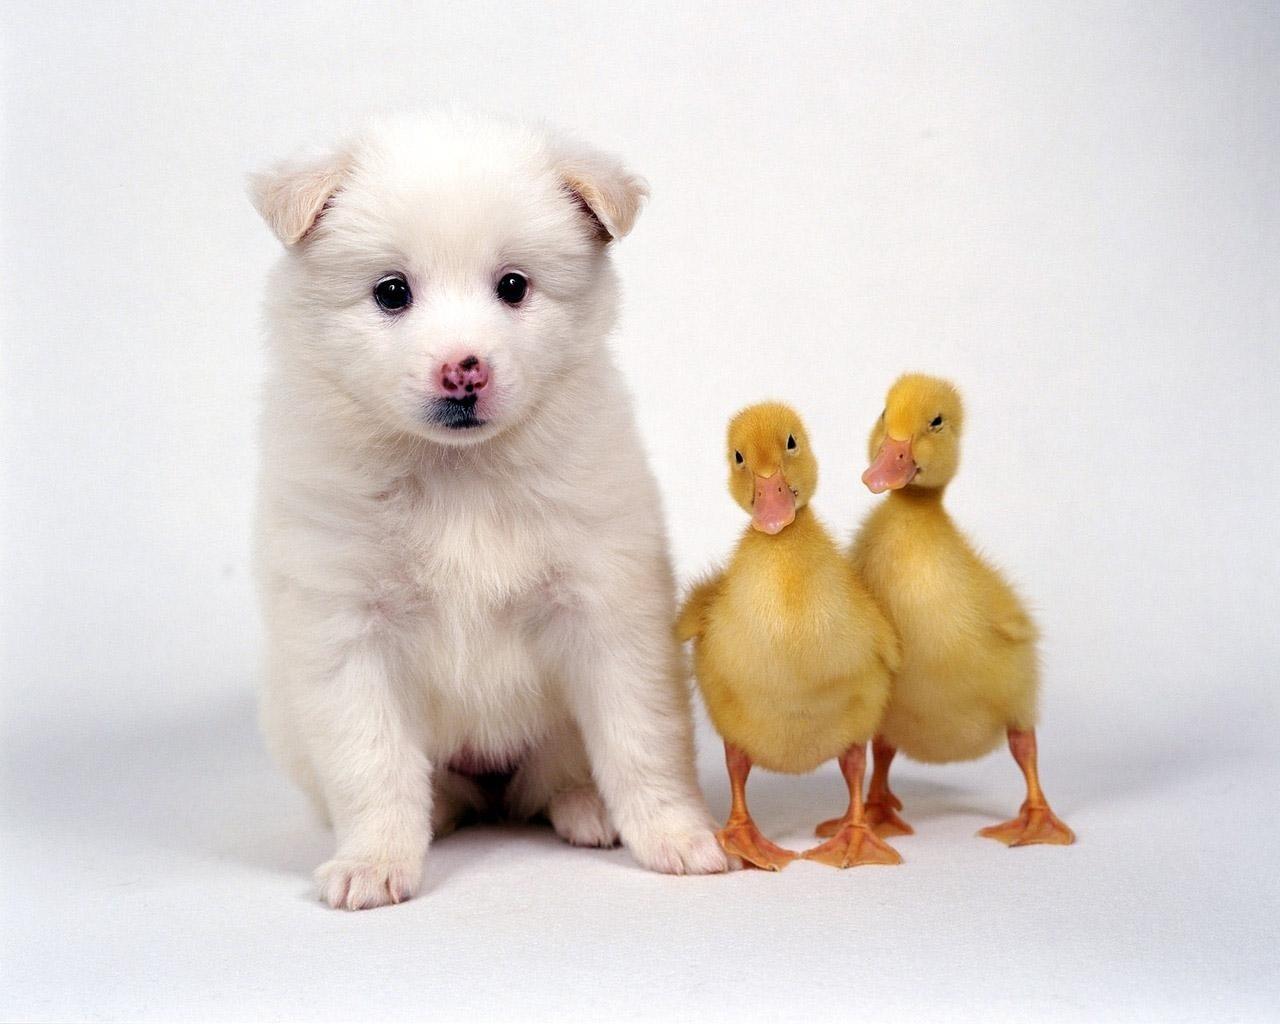 Cute Friends - Domestic Animals Wallpaper (2785606) - Fanpop